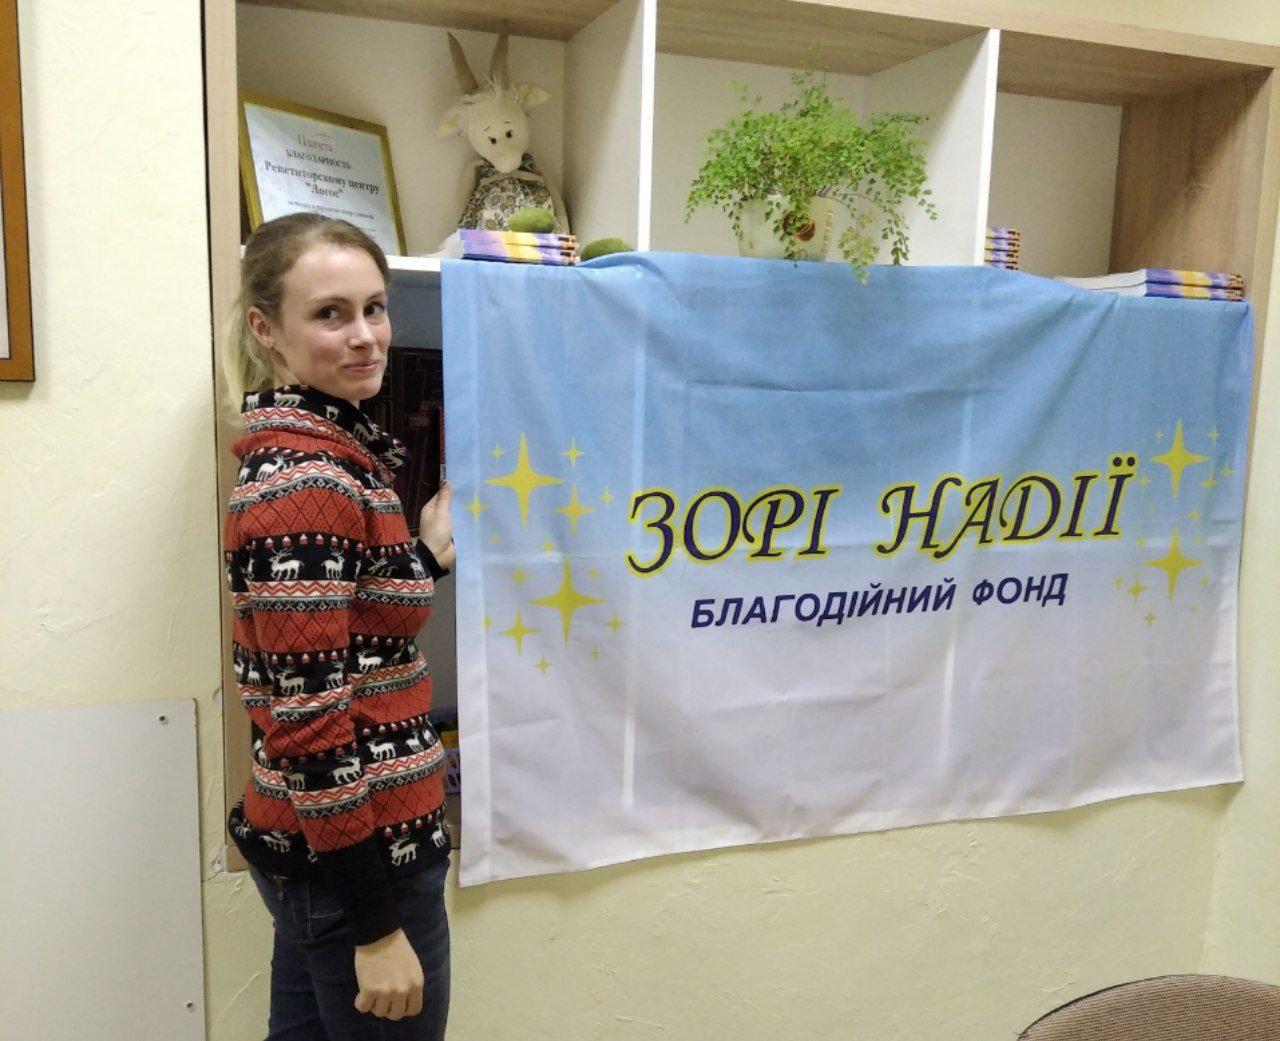 Прапор Зорі Надії